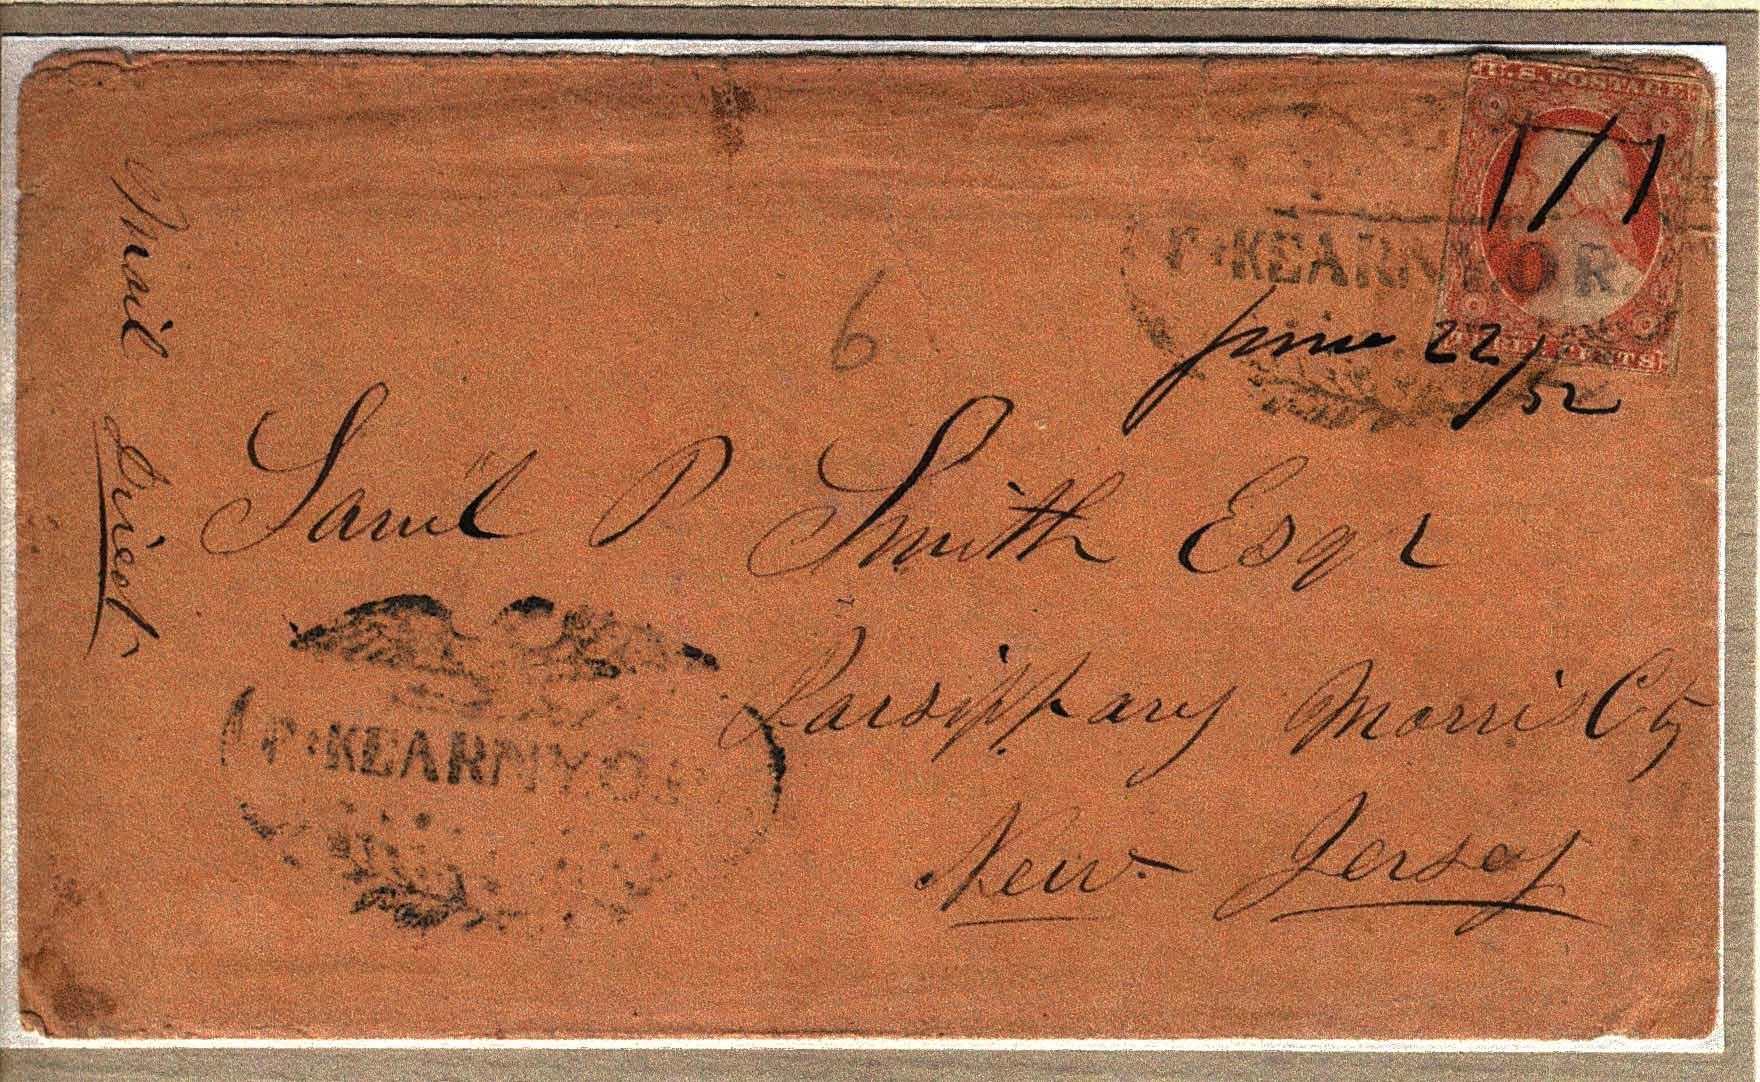 FortKearney 1852 06 22